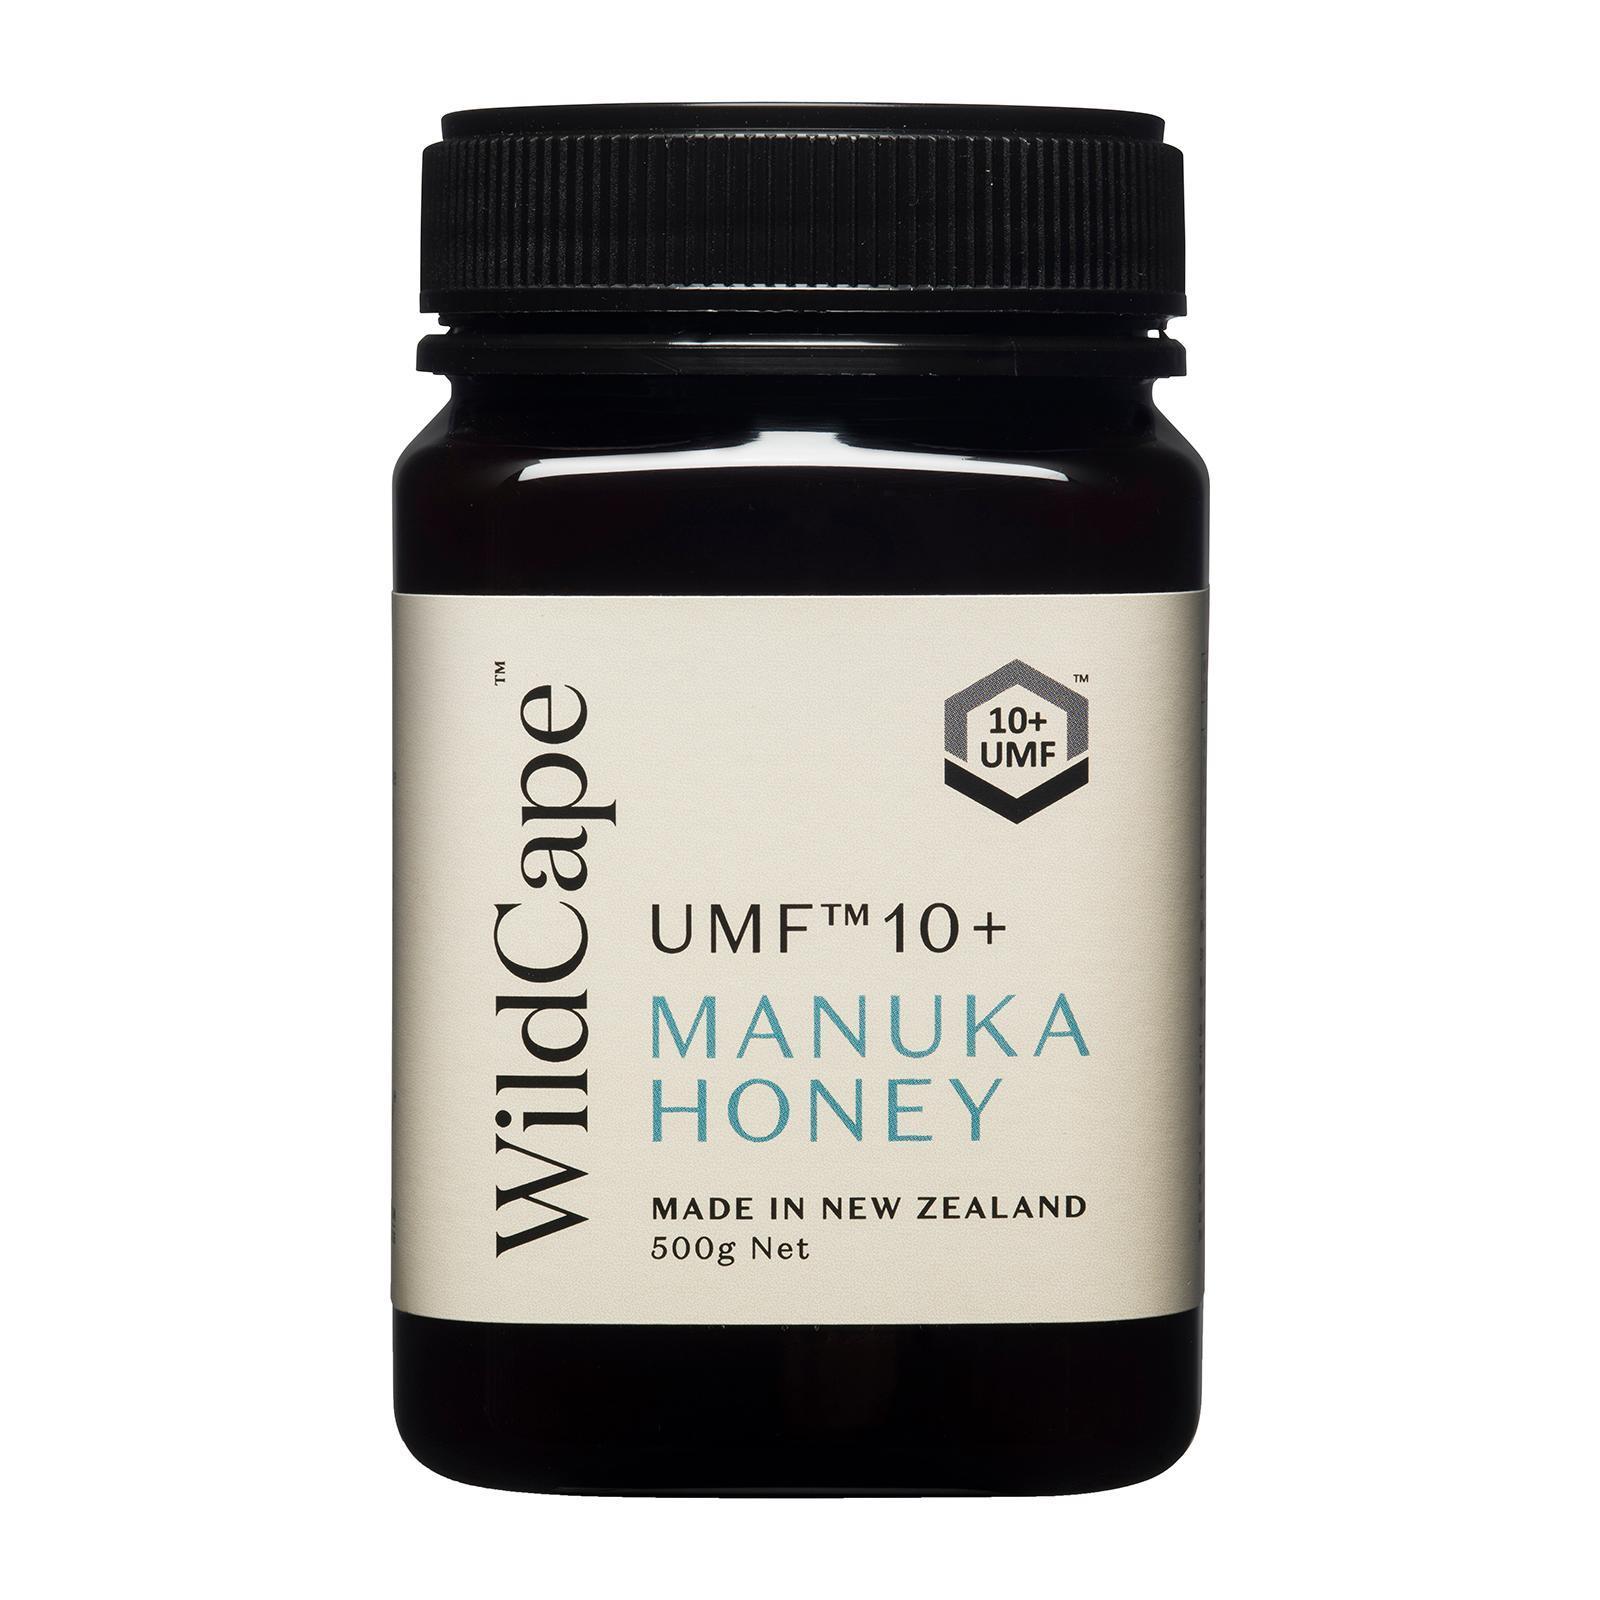 WildCape Manuka Honey UMF 10+ - By Nature's Nutrition